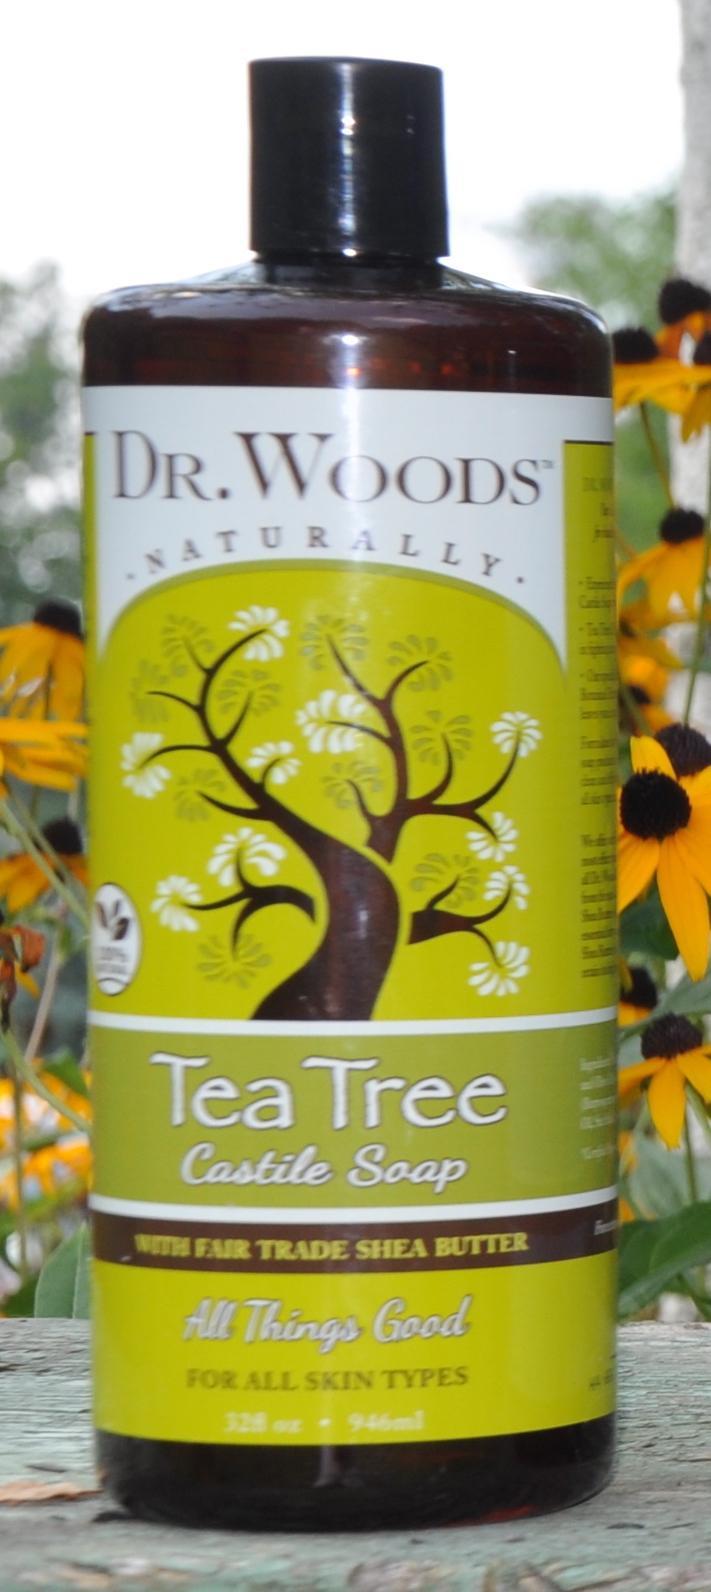 Tea Tree Castile Soap With Fair Trade Shea Butter | The